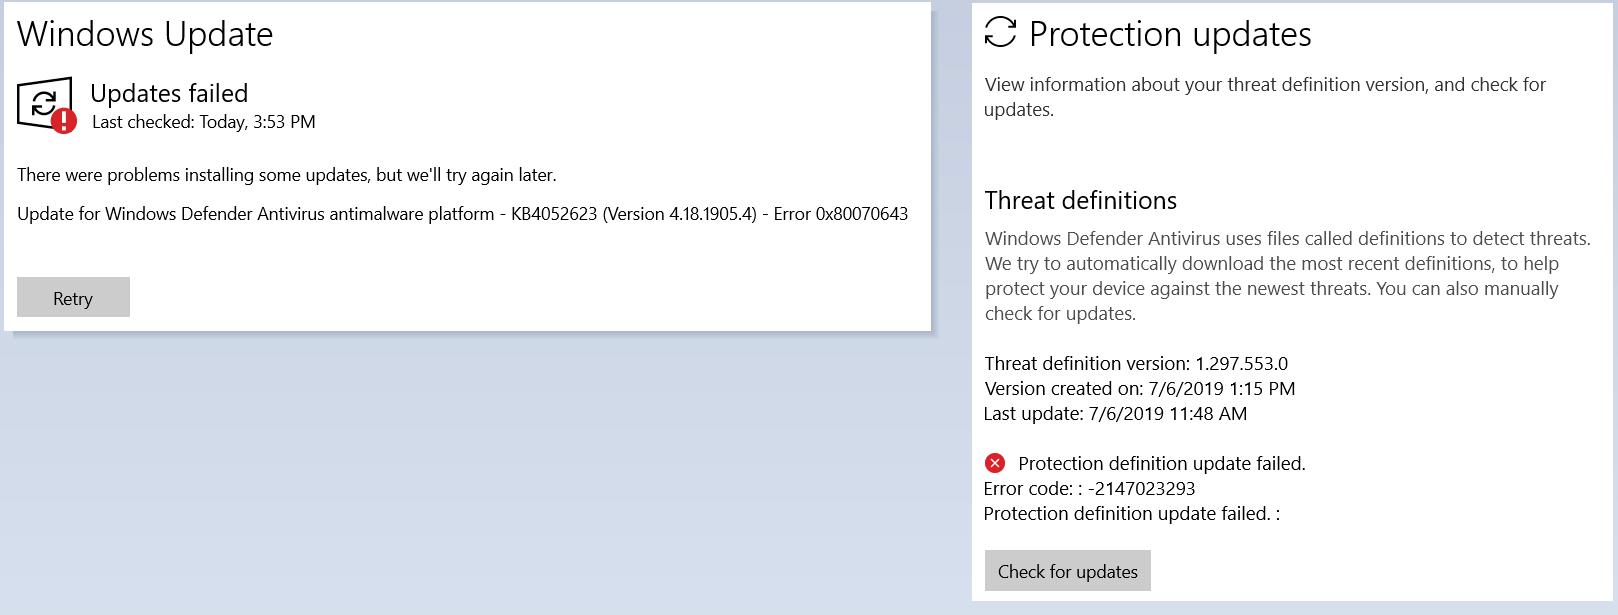 Windows Defender KB4052623 (Version 4.18.1905.4) repeated installation fail with Error... 2f4e848b-6e05-40c2-93e8-29bdff9310be?upload=true.png